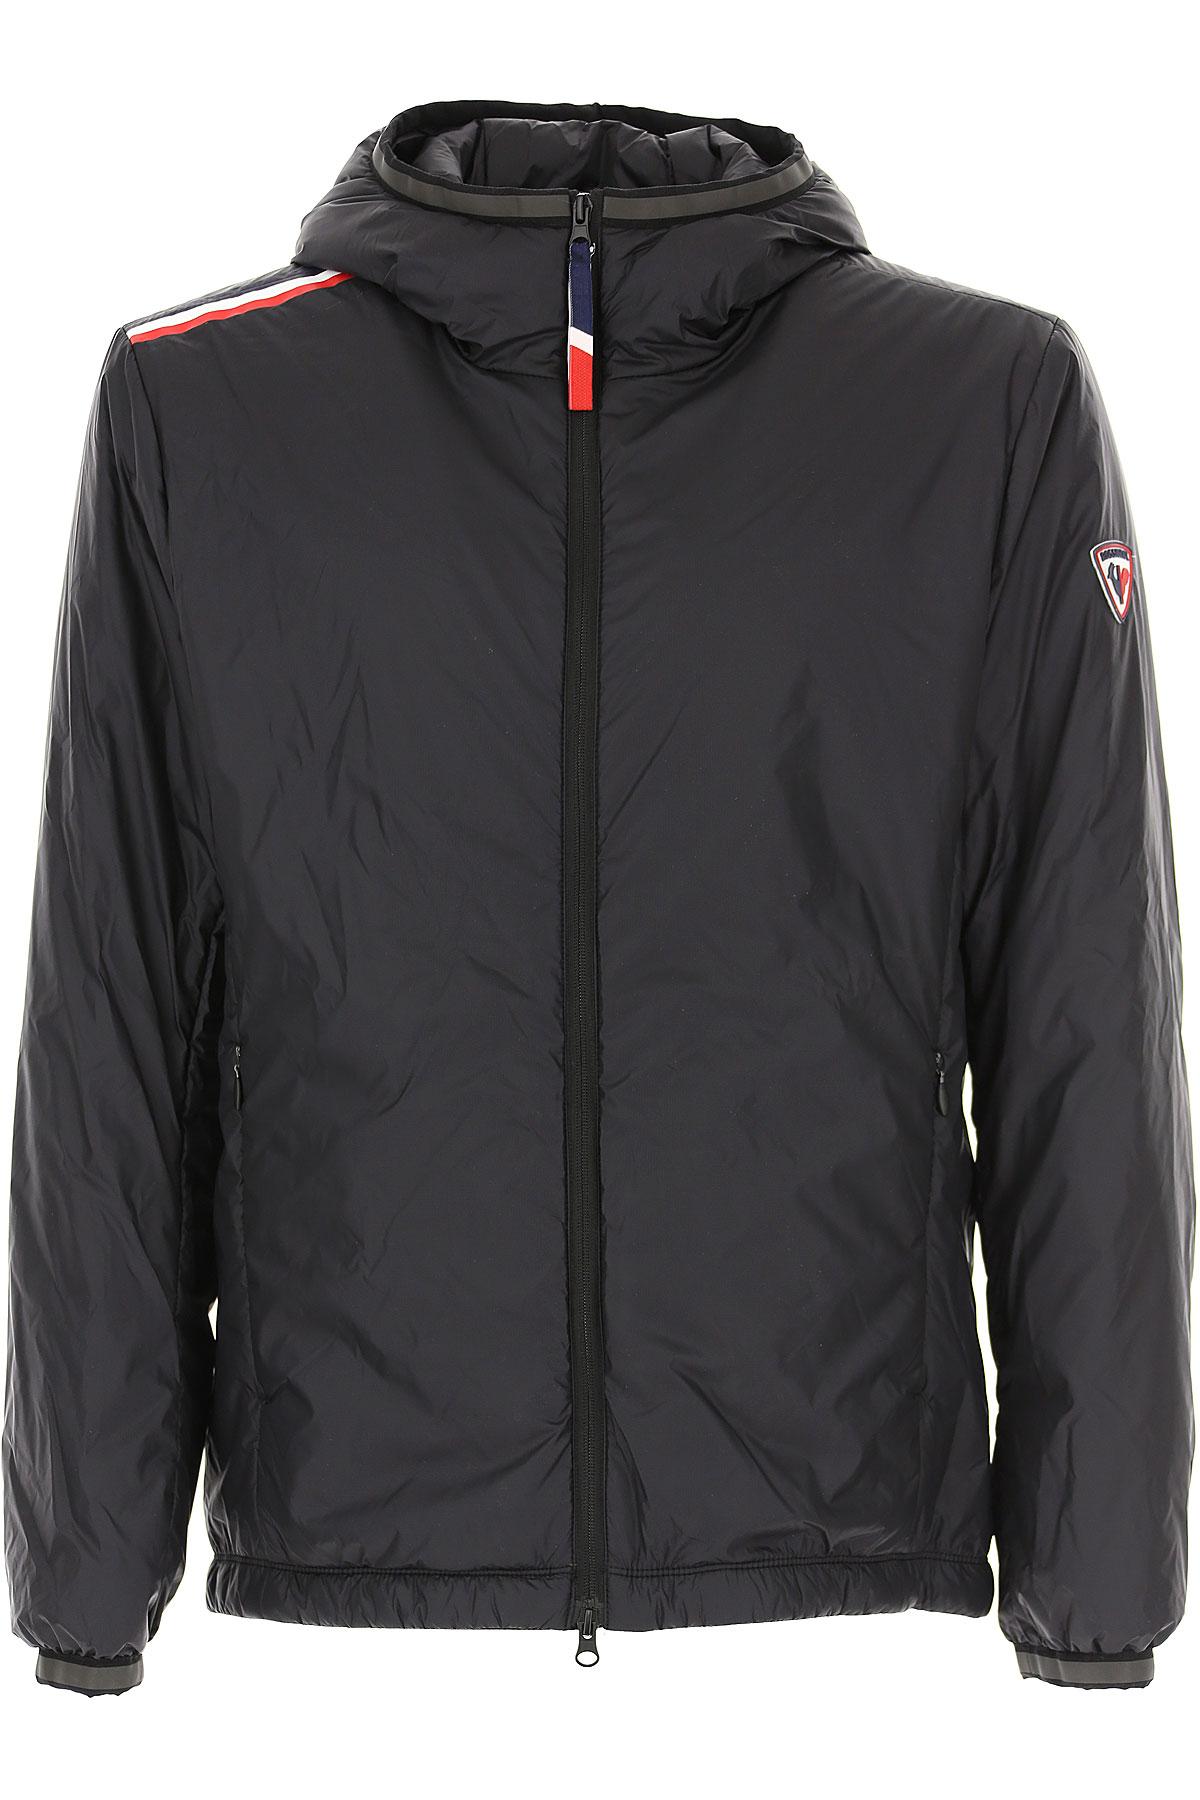 Rossignol Down Jacket for Men, Puffer Ski Jacket, Black, polyamide, 2019, L XL